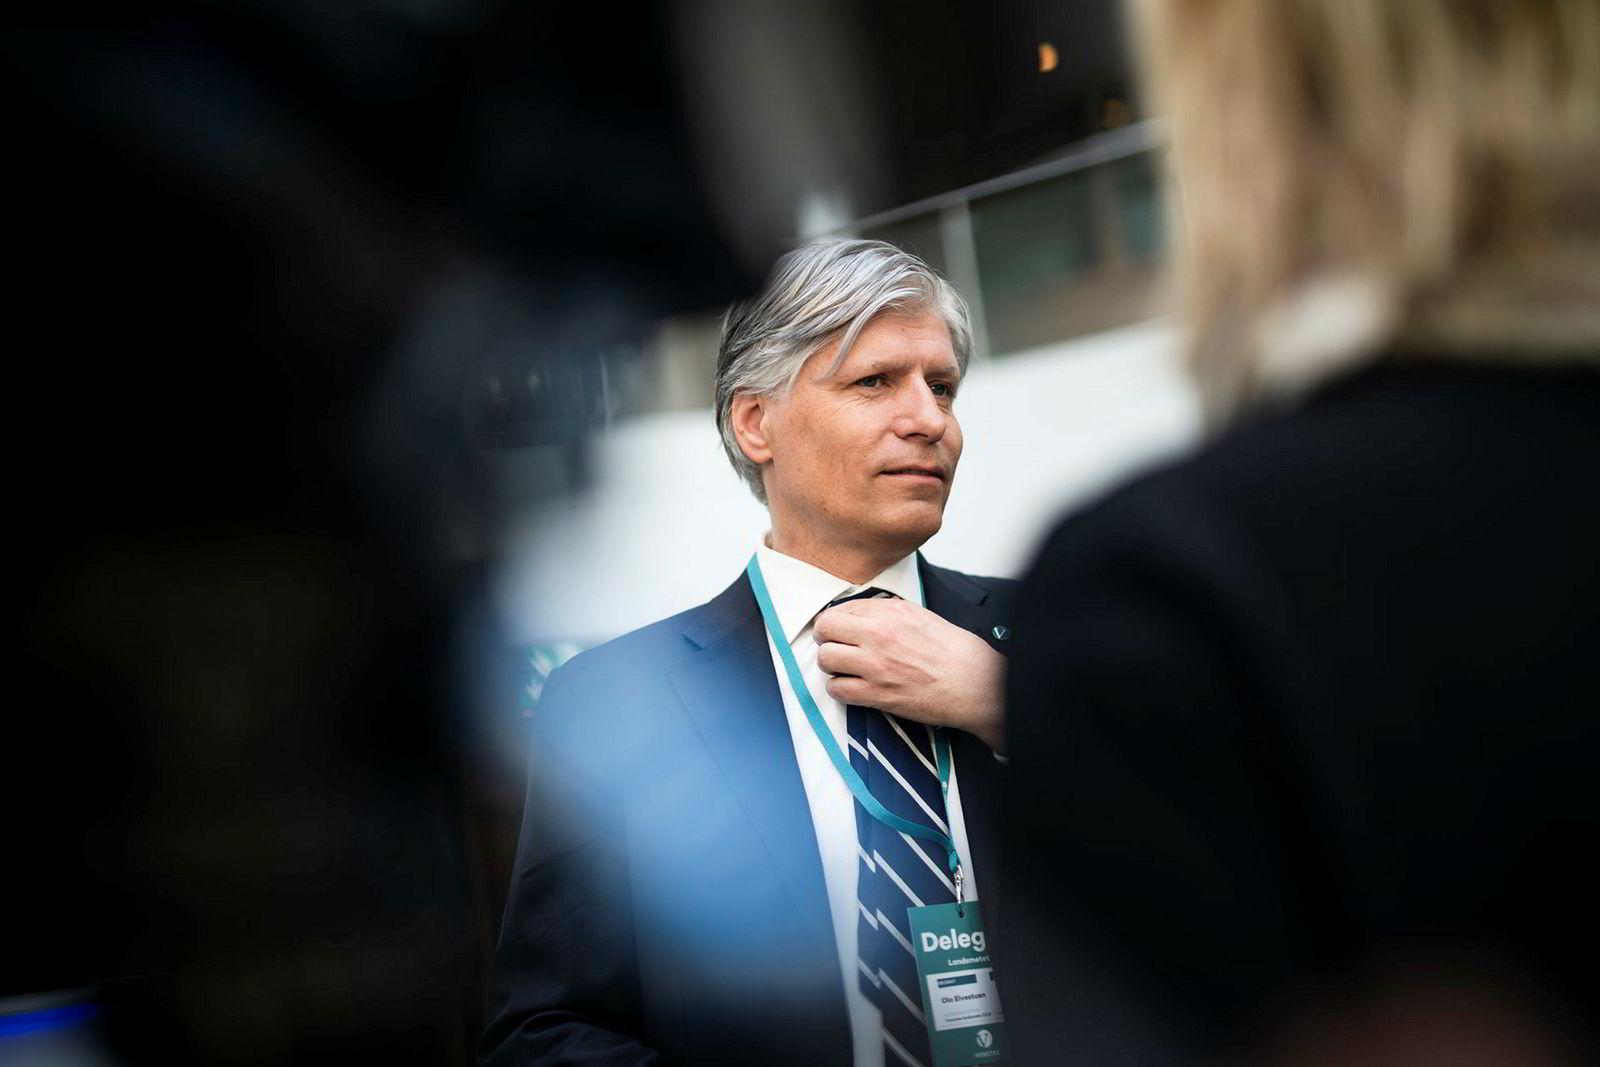 Uber ville blant annet møte klima- og miljøminister Ola Elvestuen. Her er han på landsmøtet til Venstre i år.